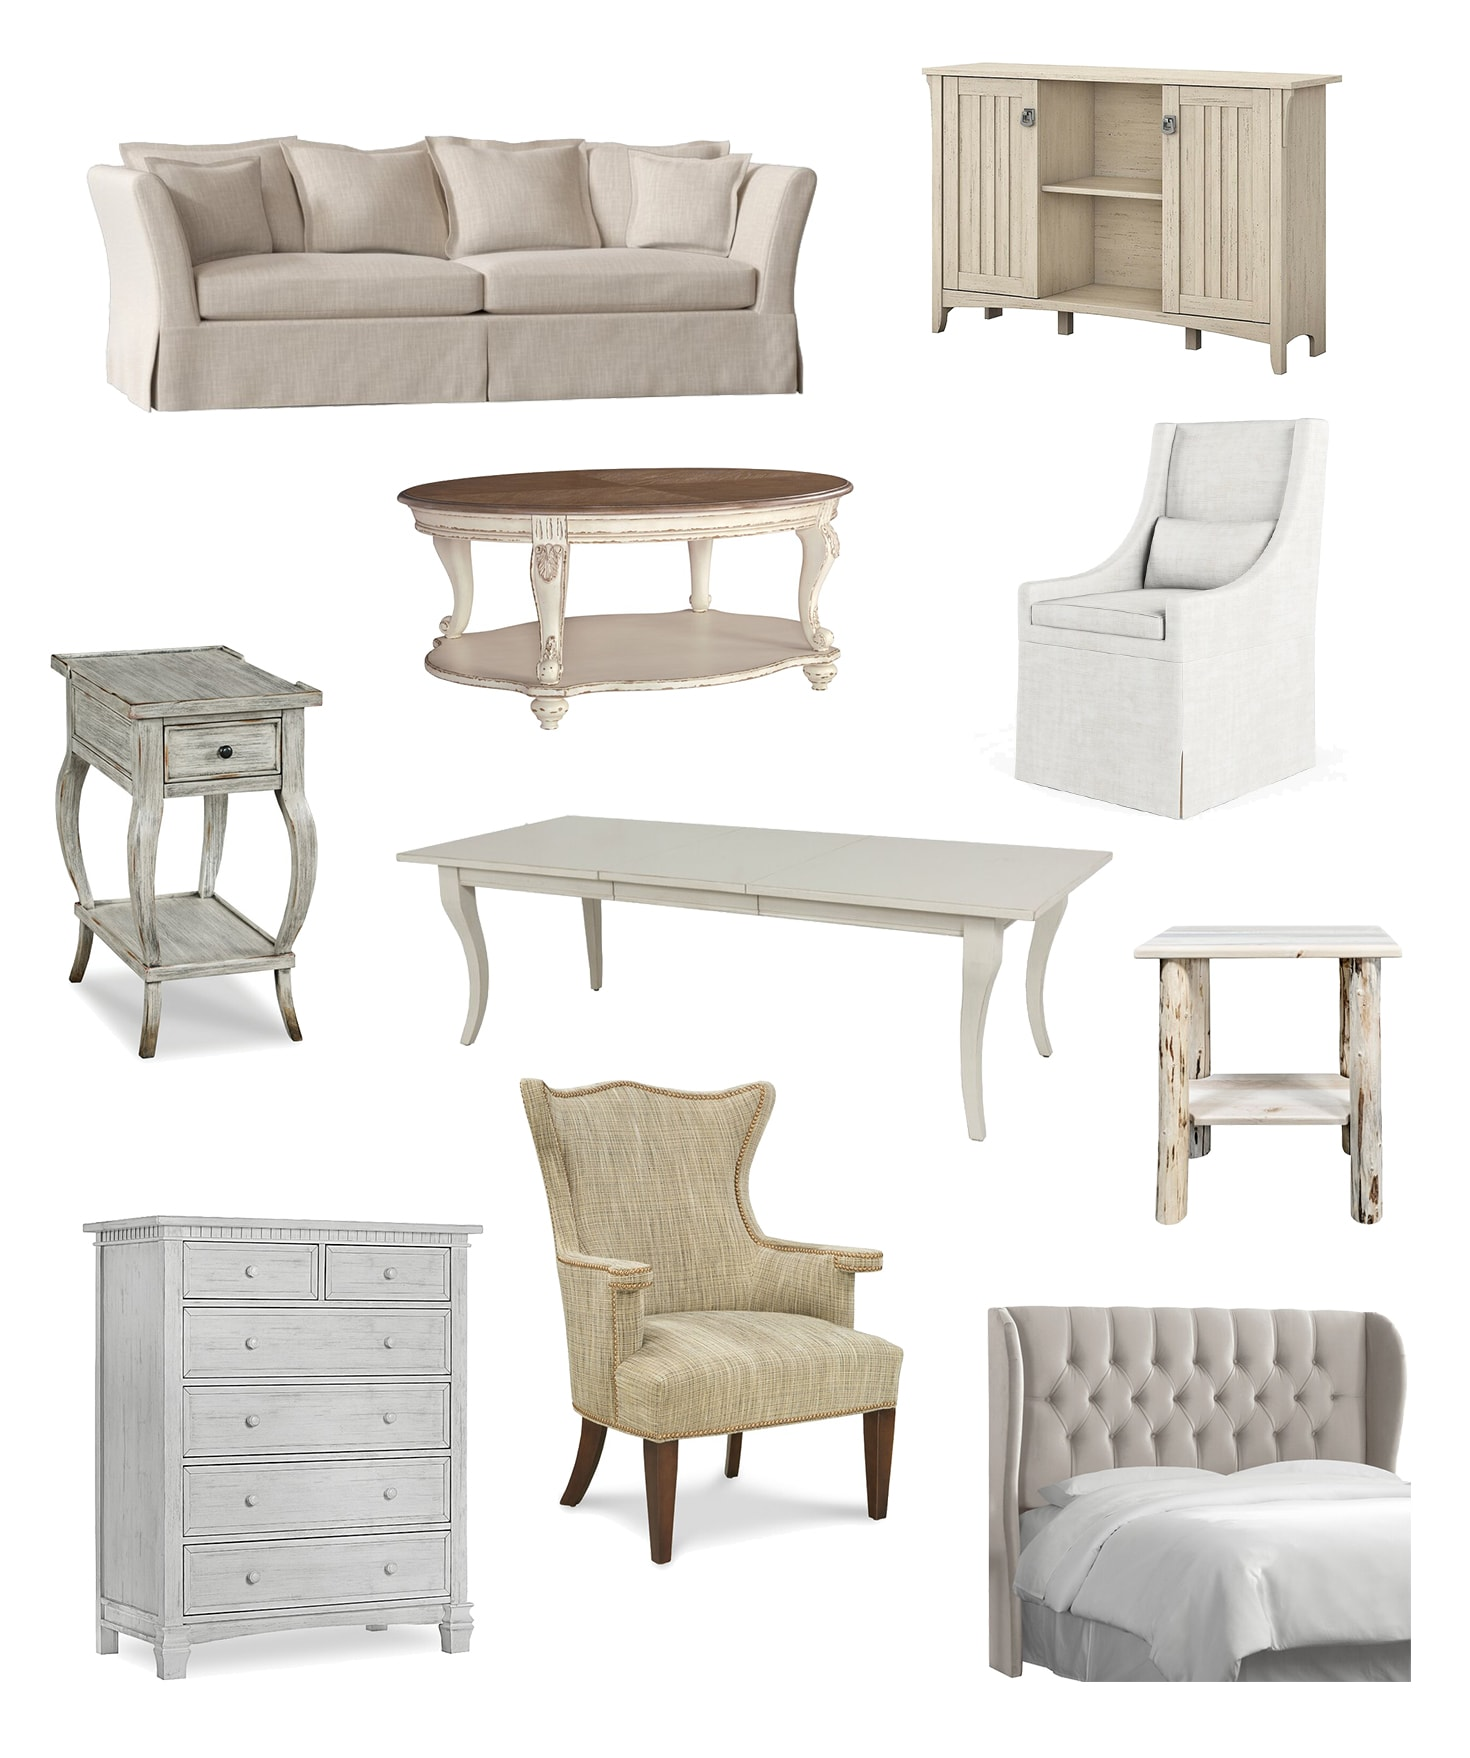 Made in USA Modern Farmhouse Furniture: Shopping Guide